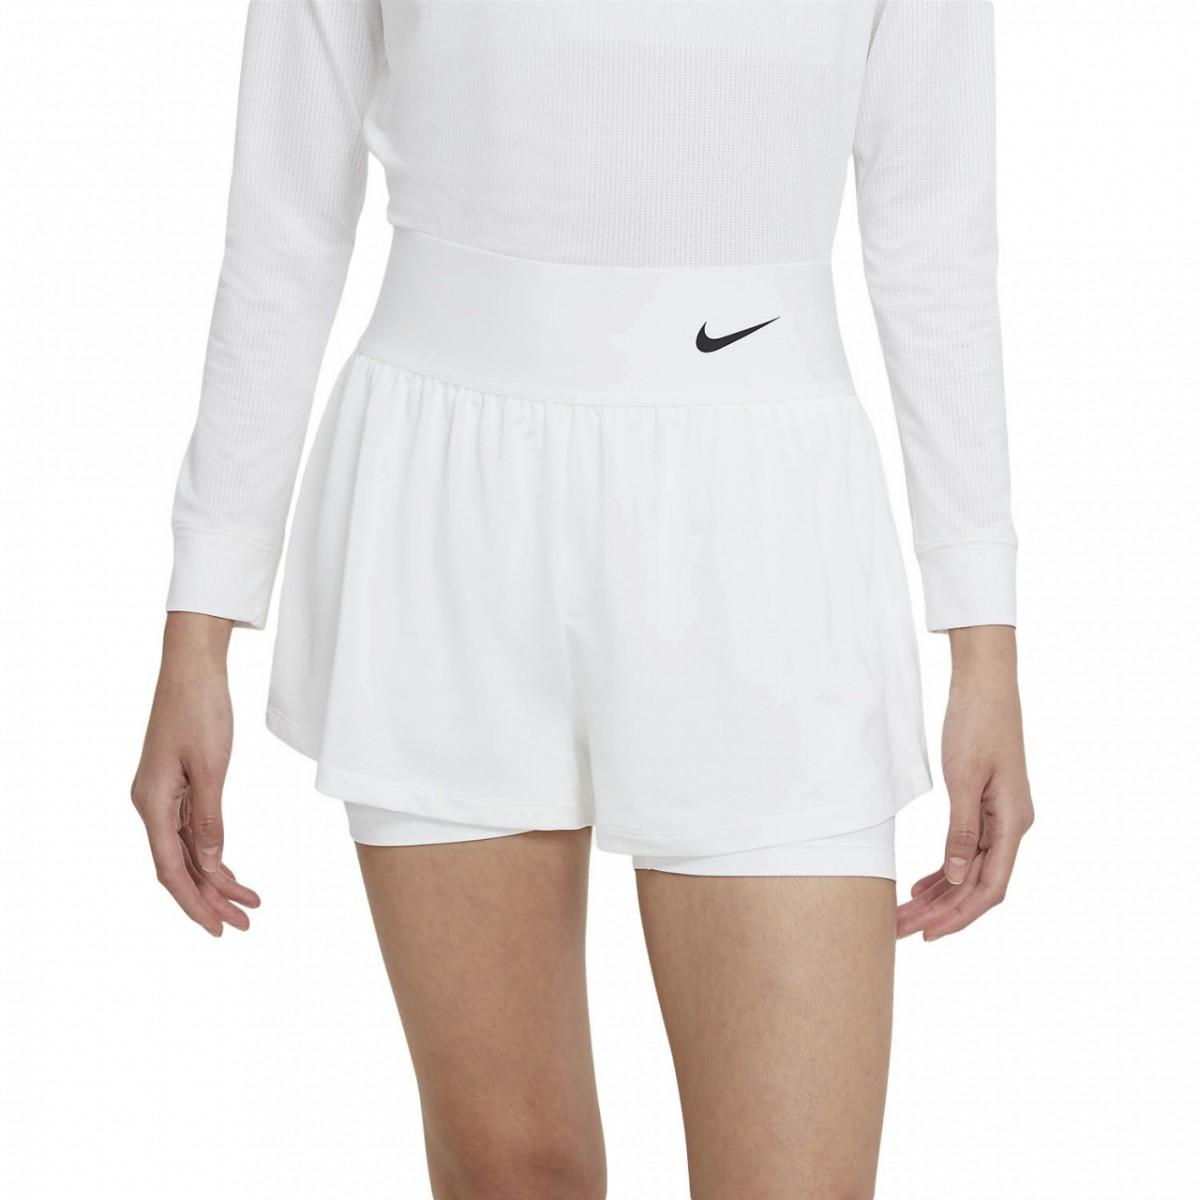 Теннисные шорты женские Nike Court Advantage Short white/black